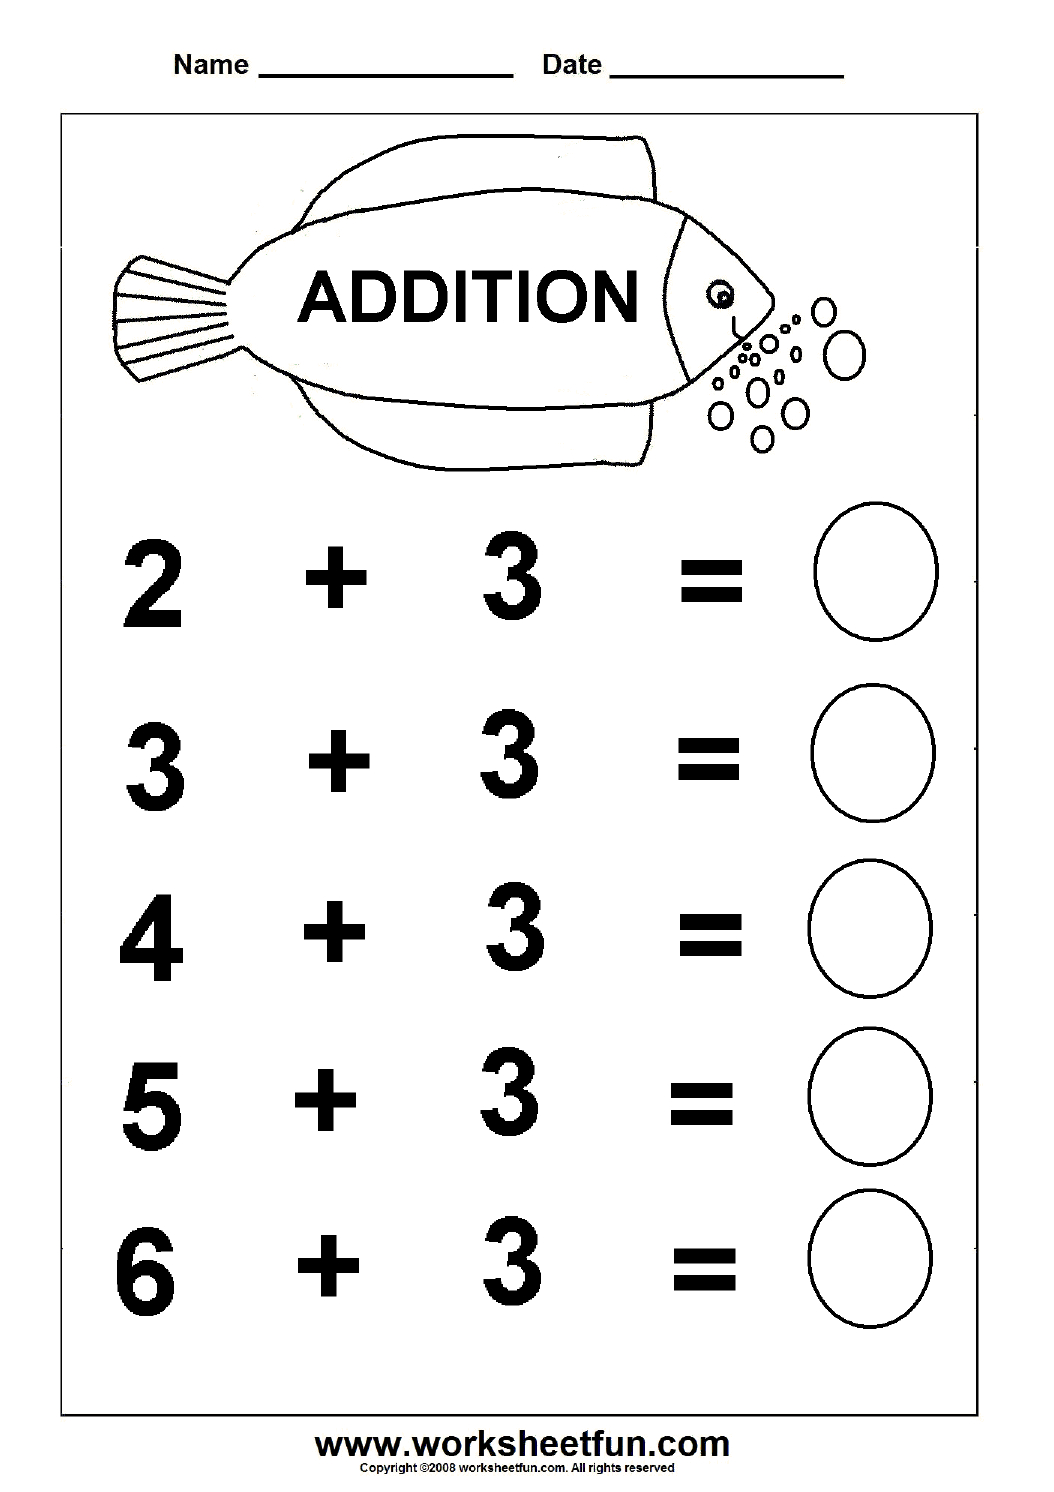 Beginner Addition – 6 Kindergarten Addition Worksheets / Free   Free Printable Preschool Addition Worksheets